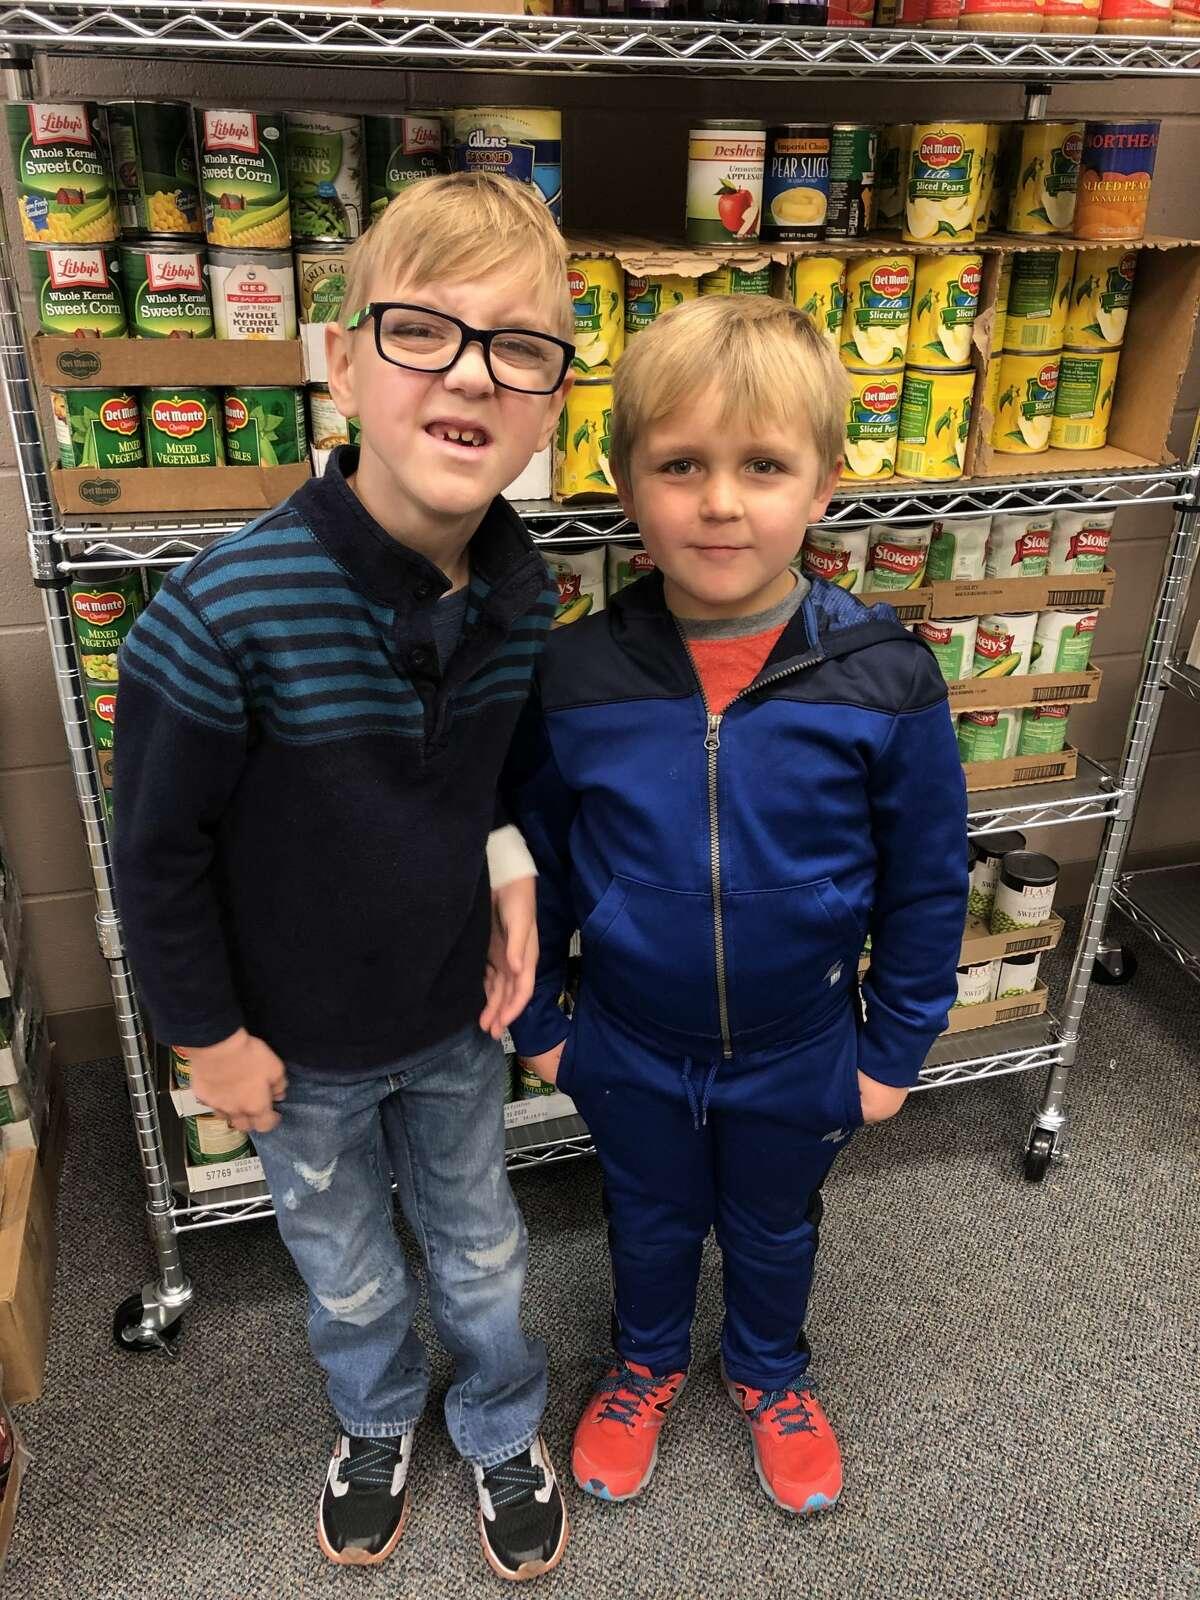 Food pantry: Kian Thoma, left, and Liam Nathan